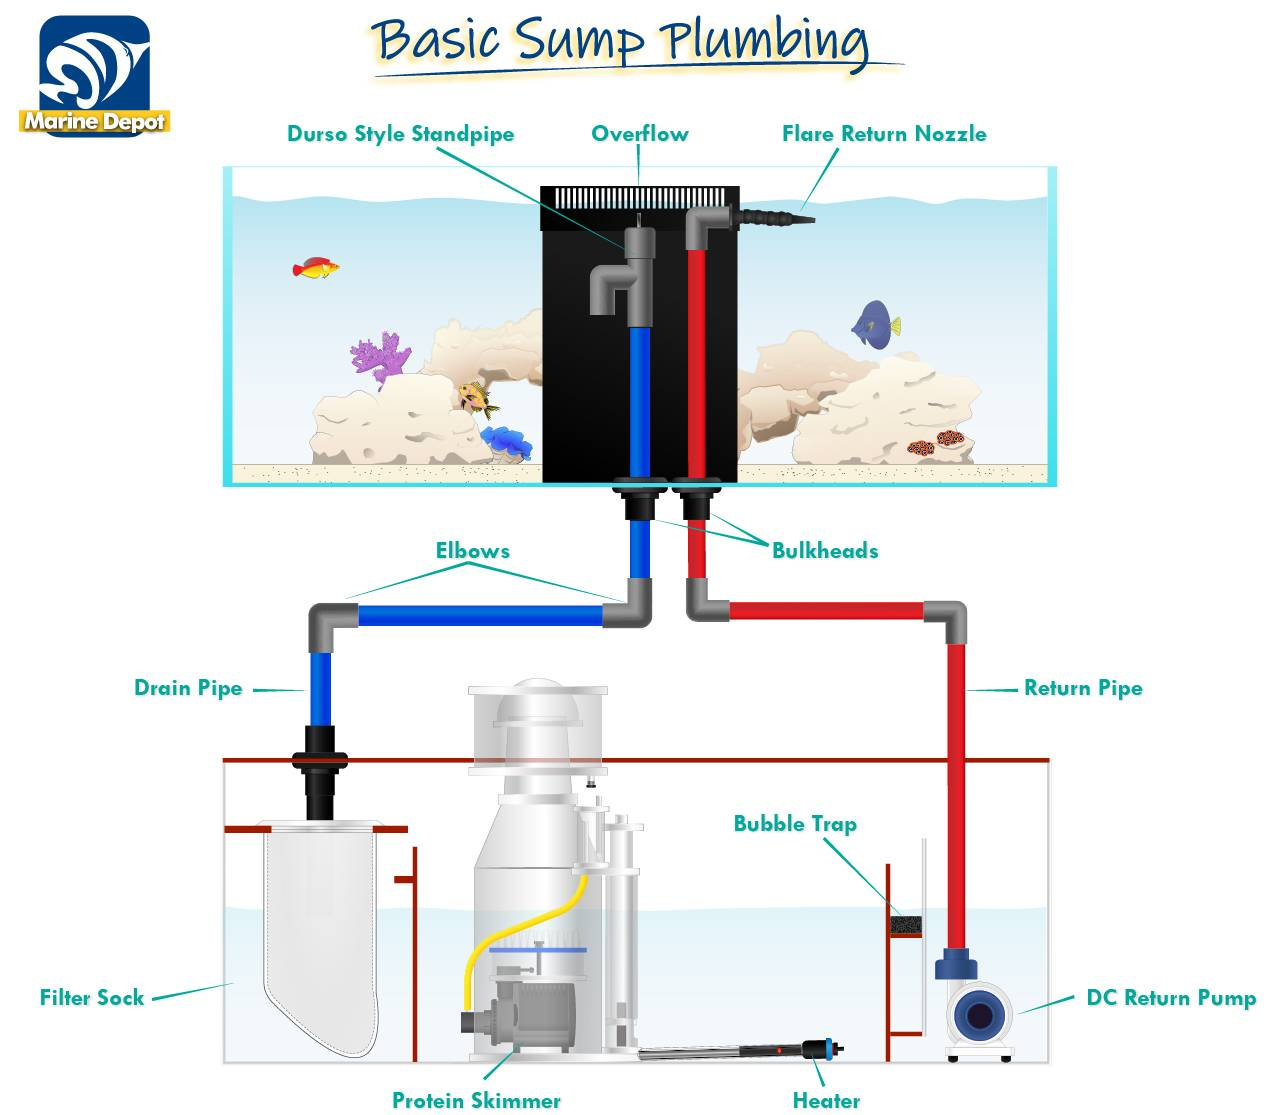 Basic Sump